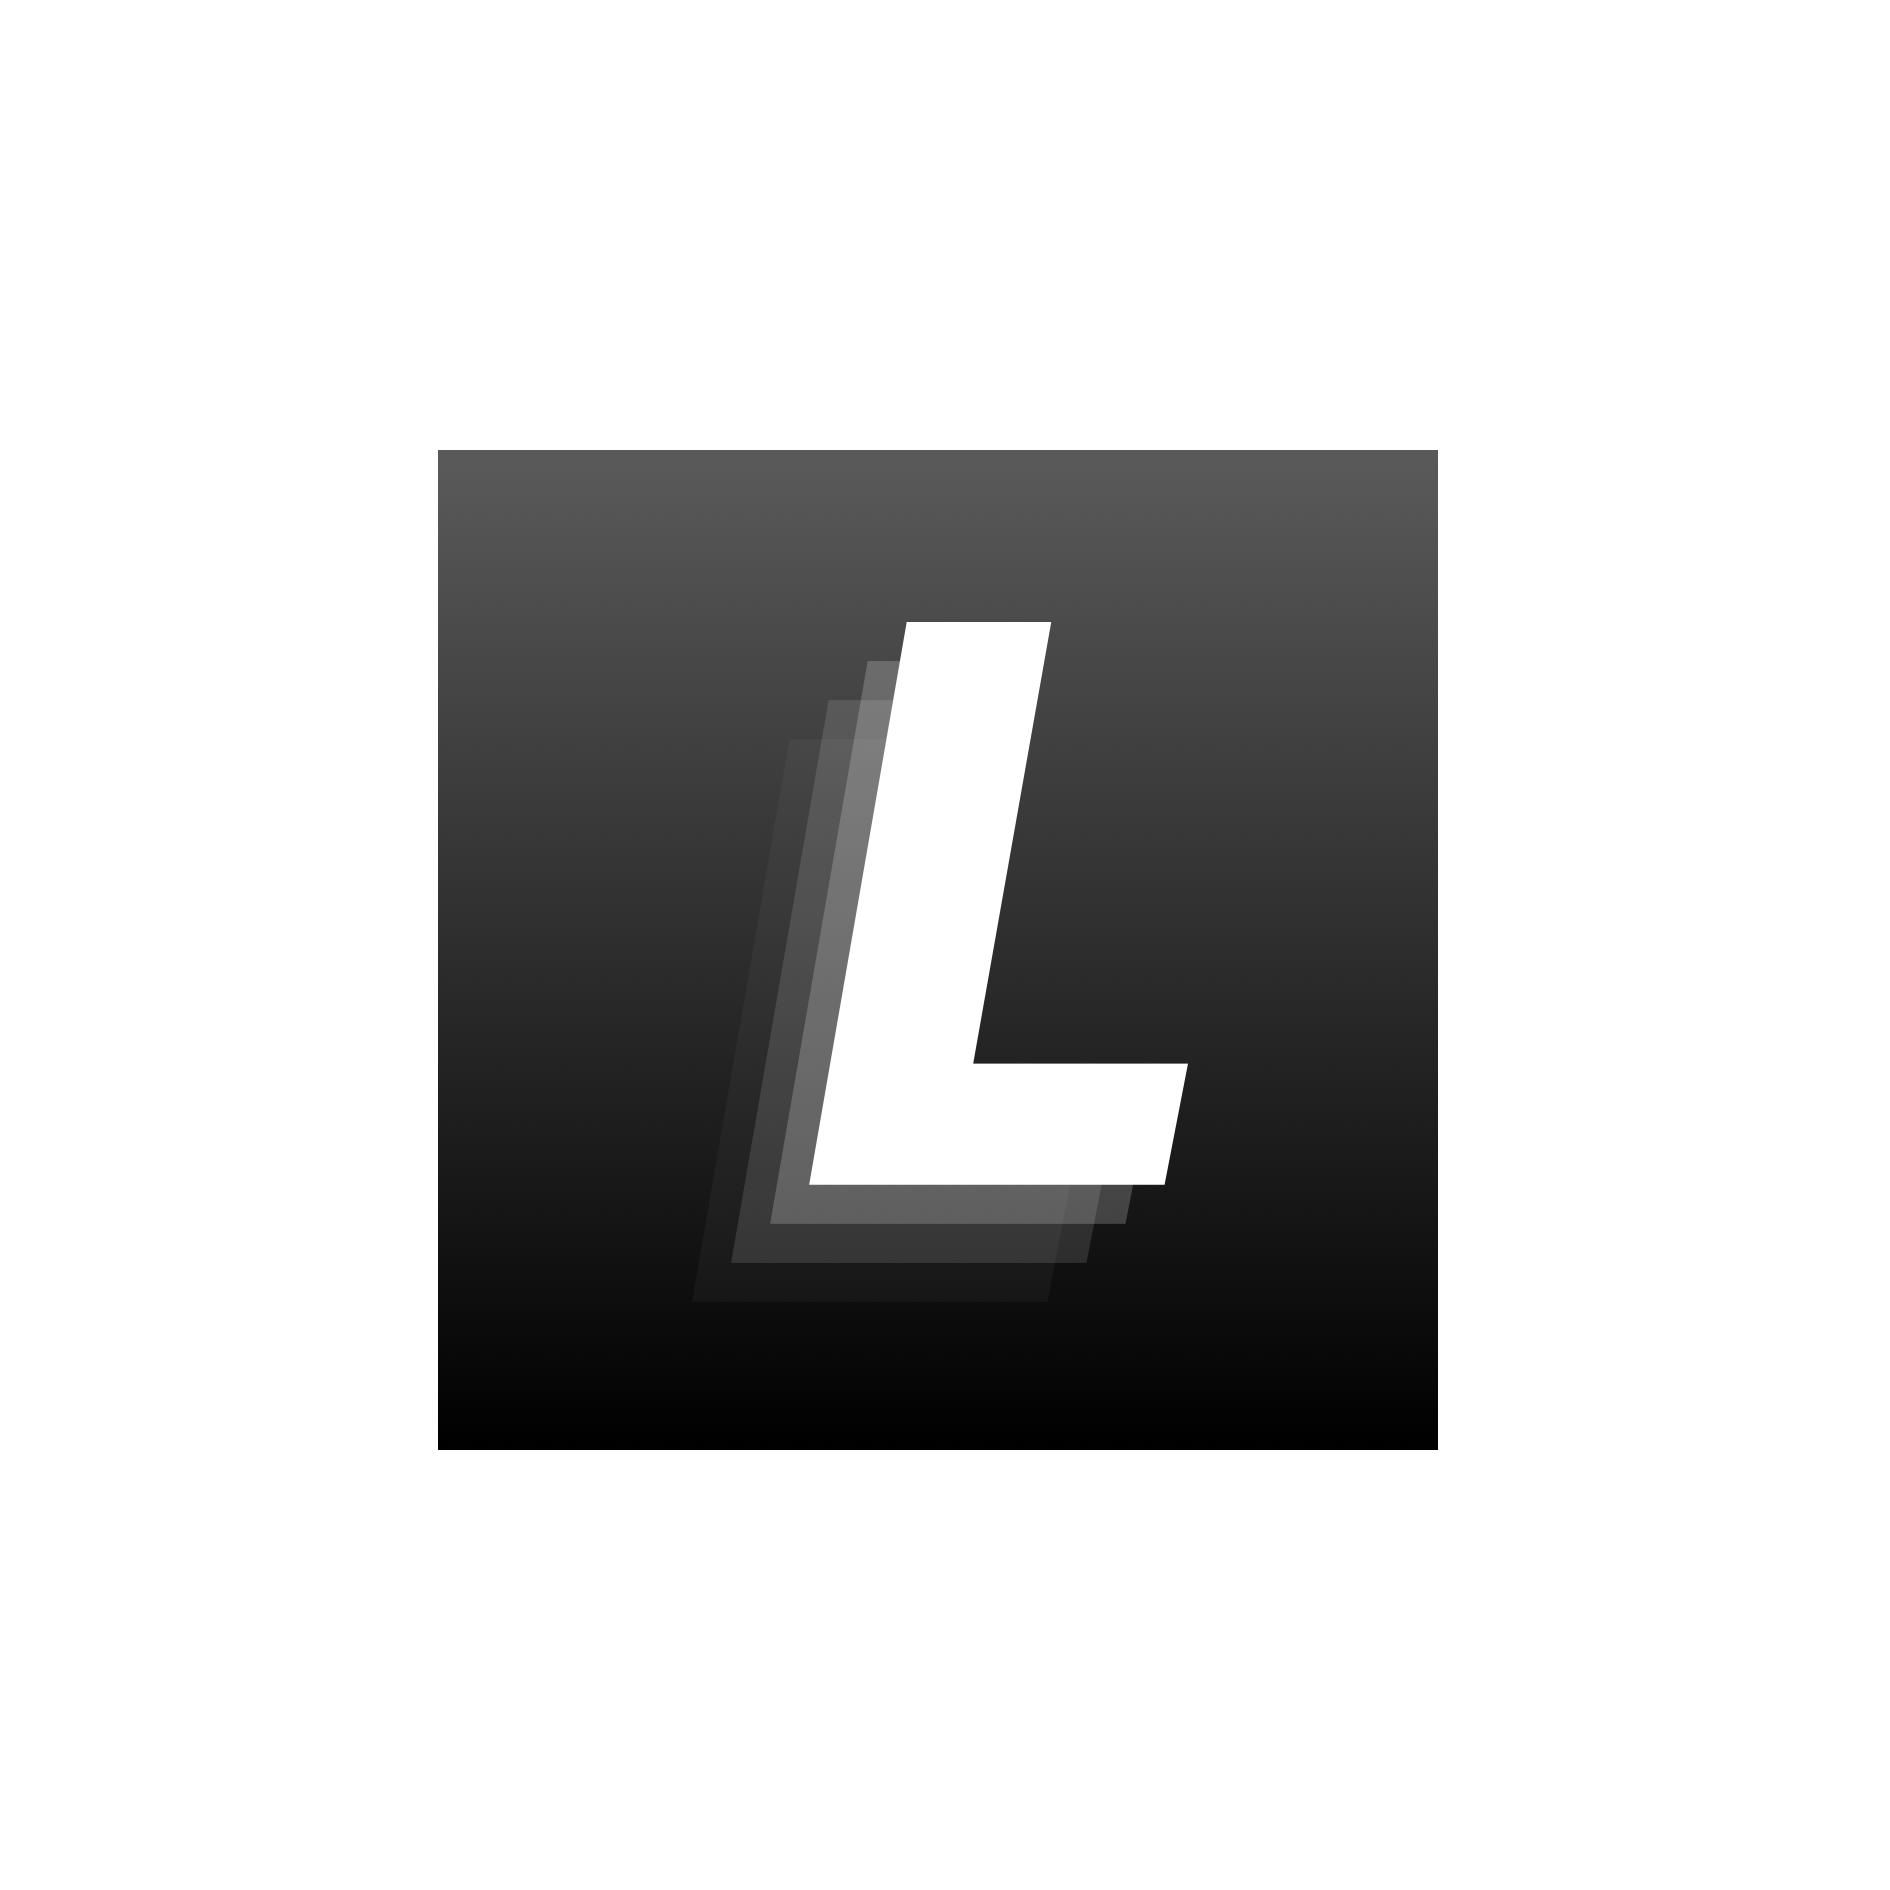 Launchberg